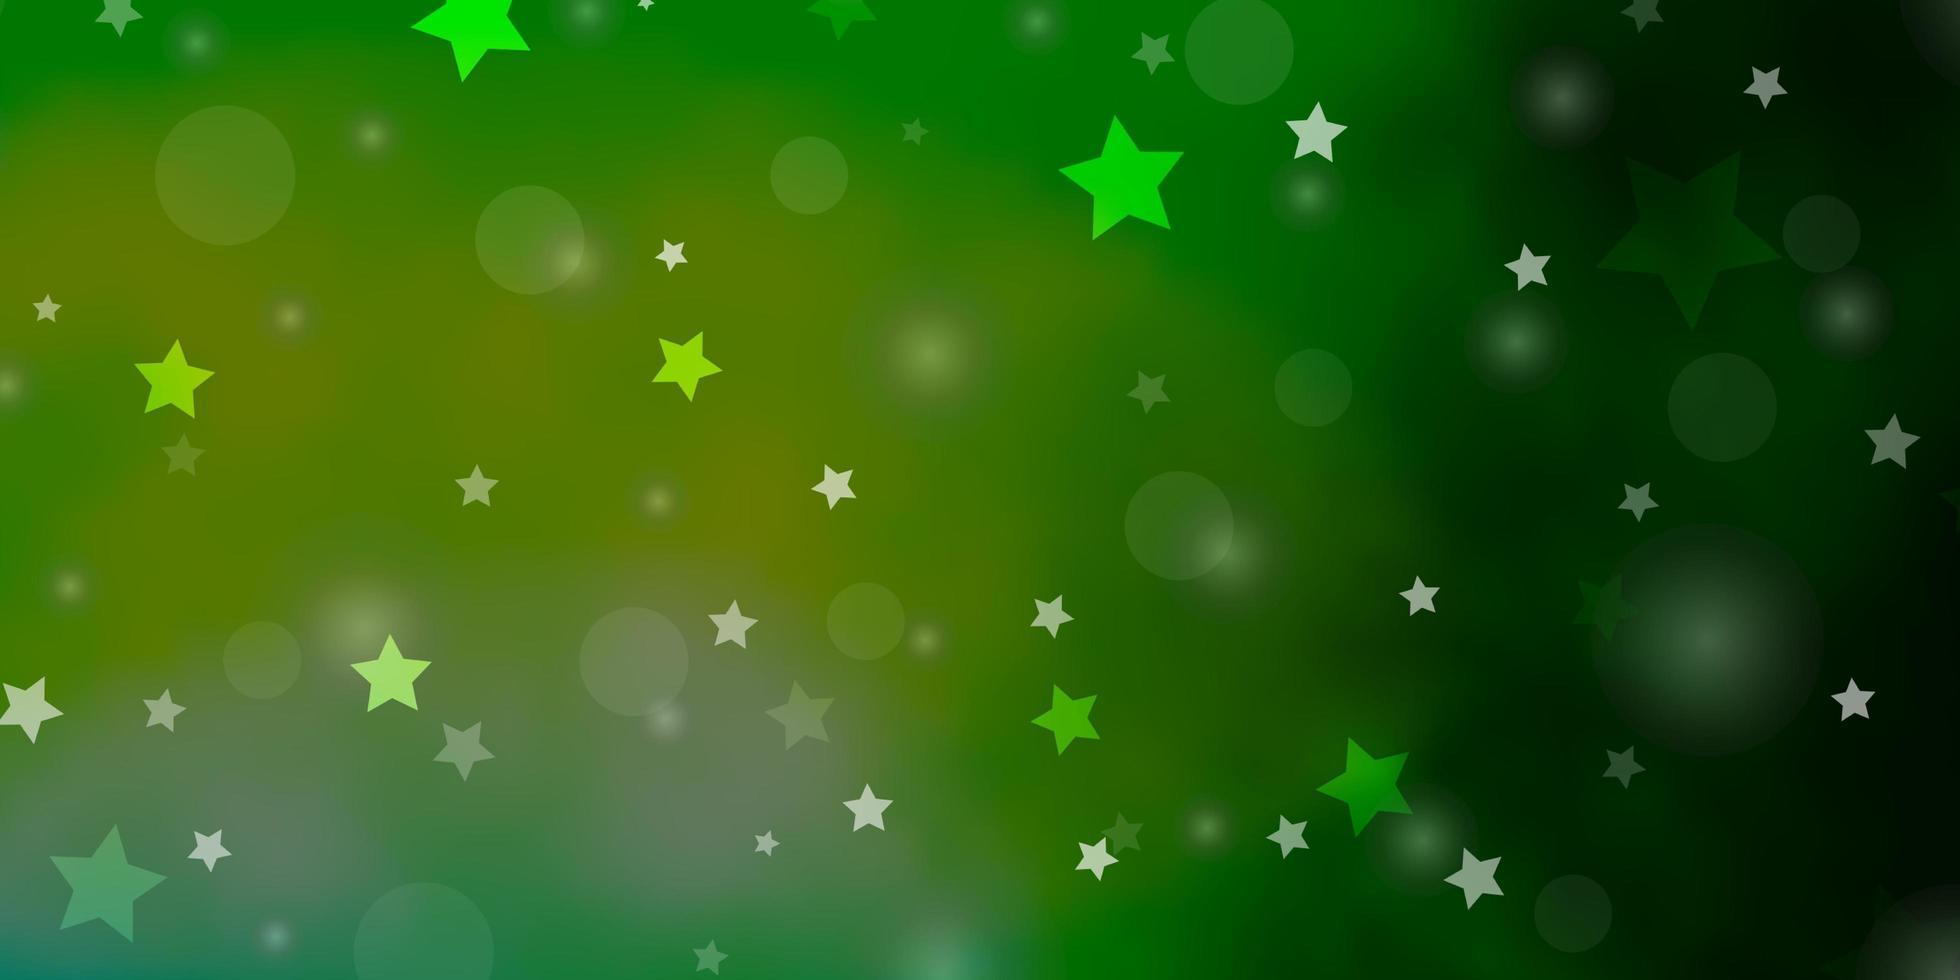 lichtgroene achtergrond met cirkels, sterren. vector